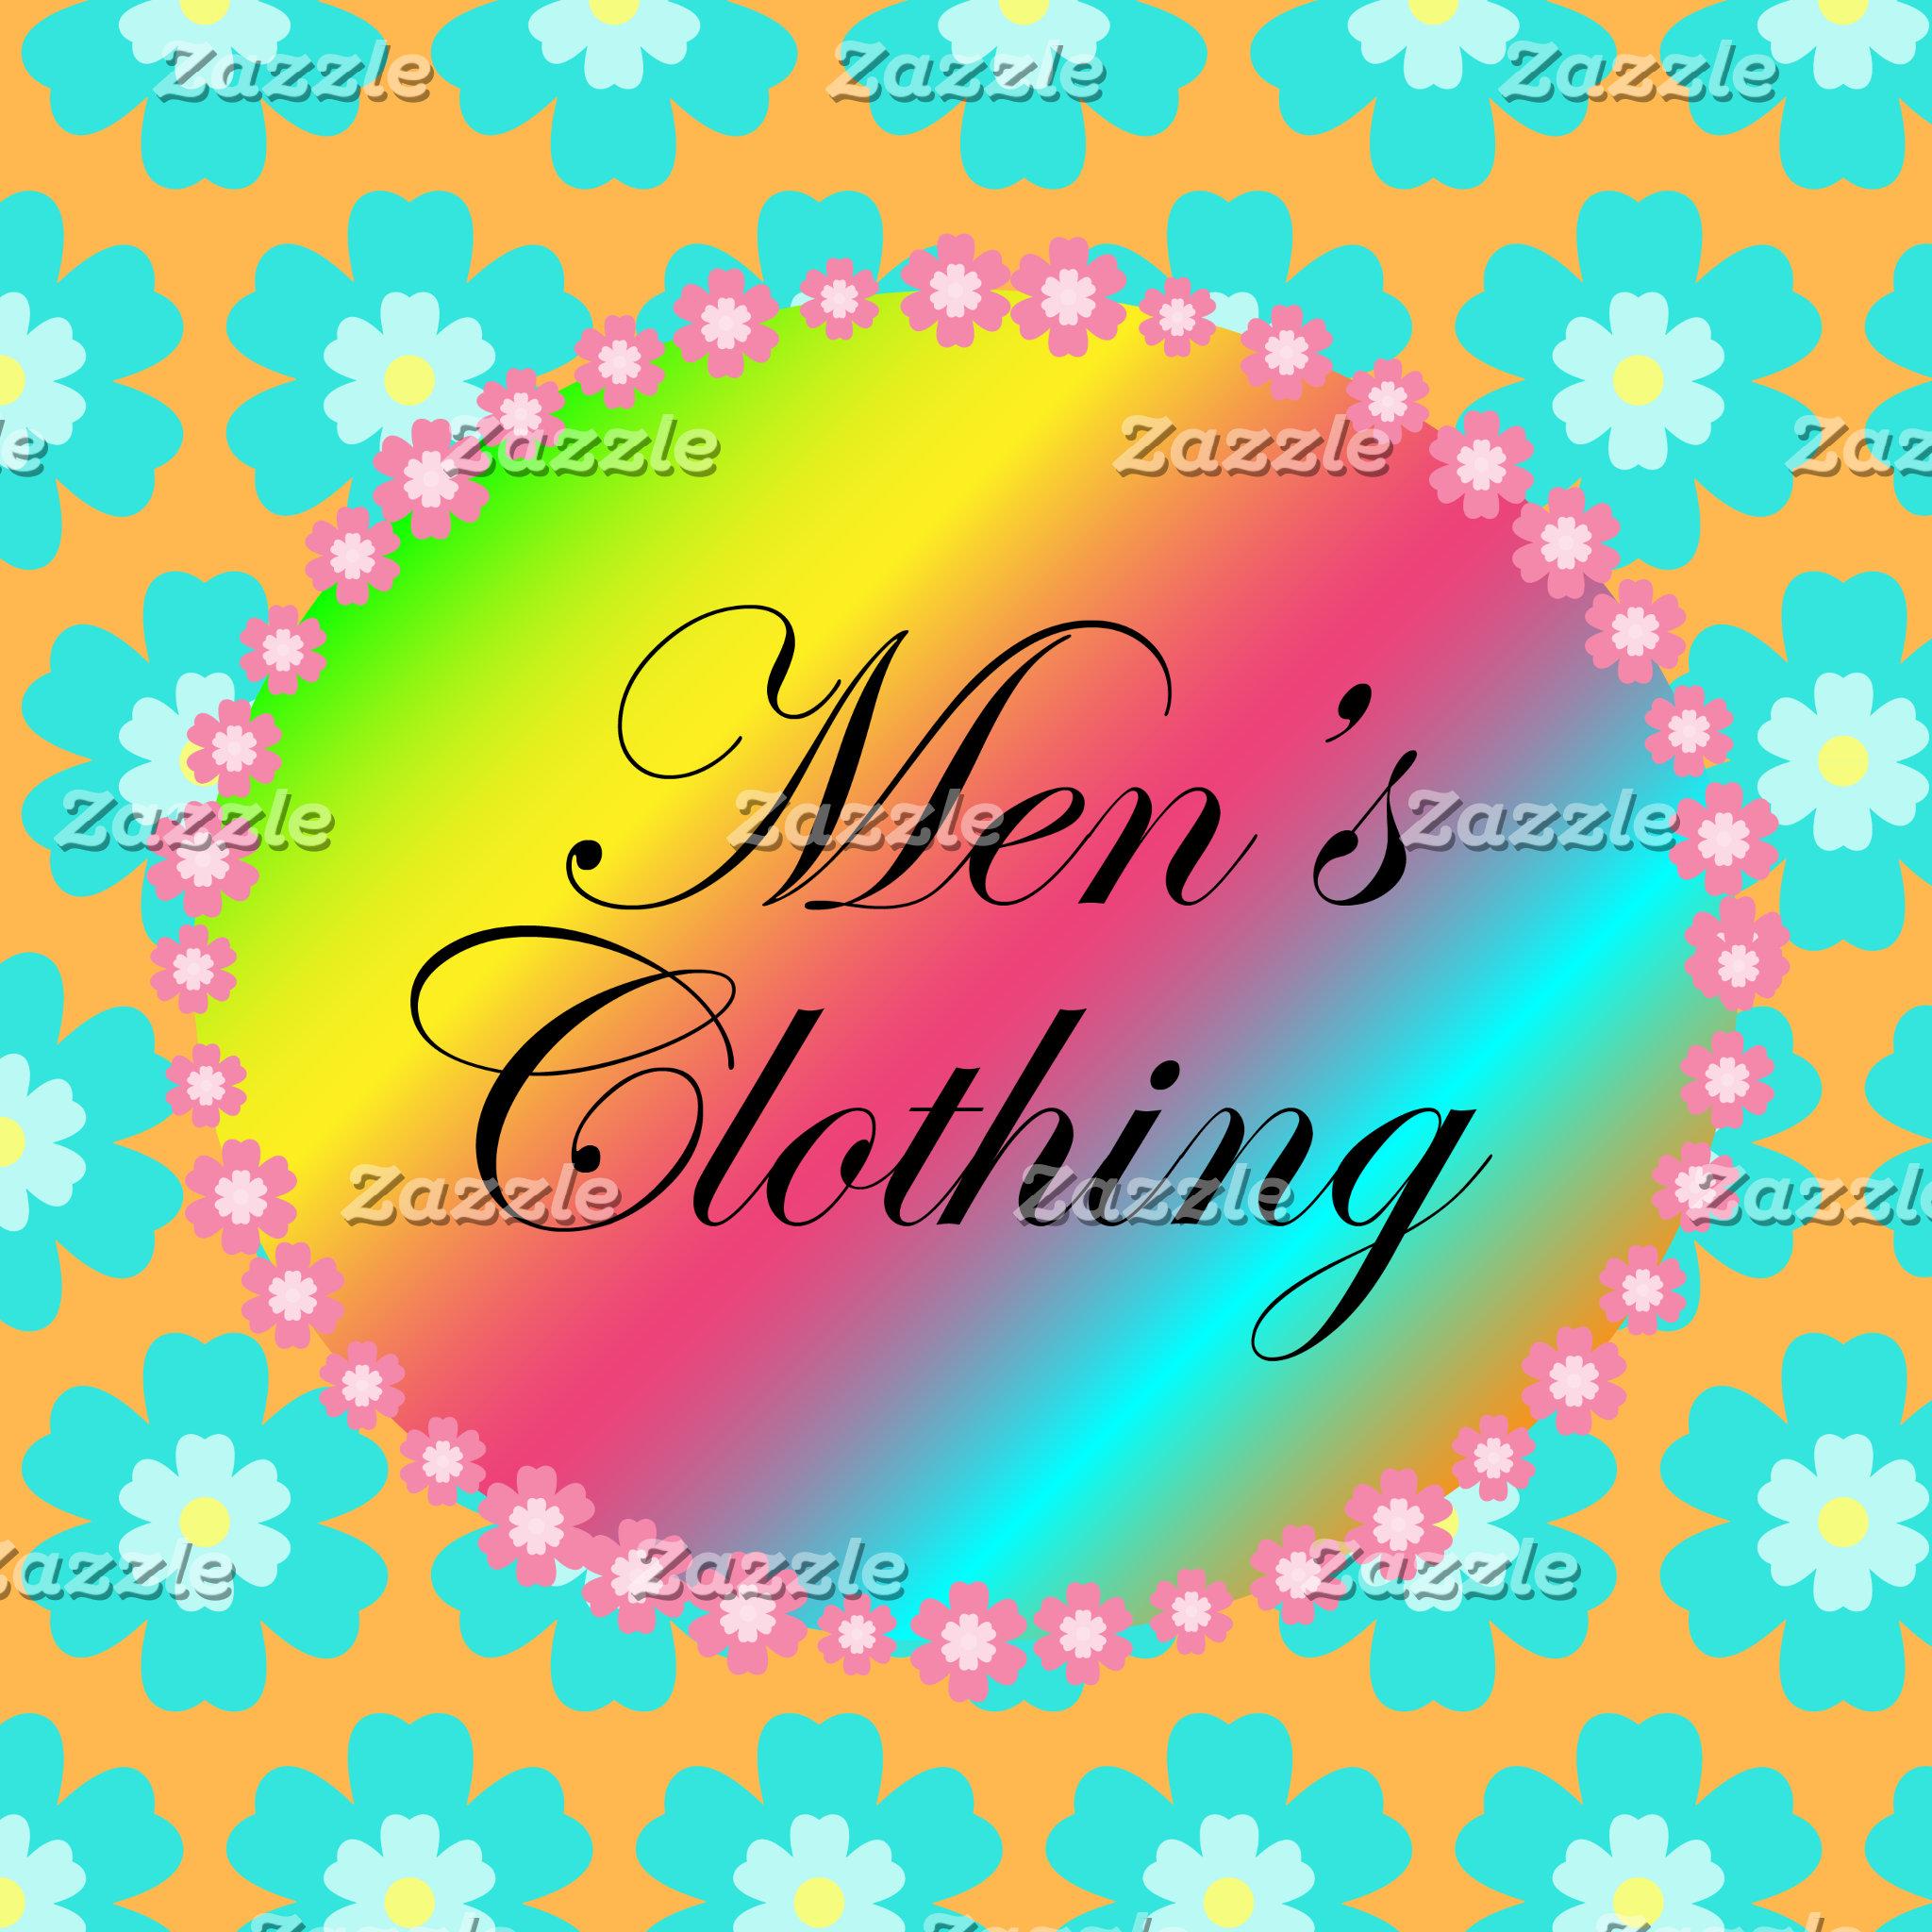 05. Men's Clothing